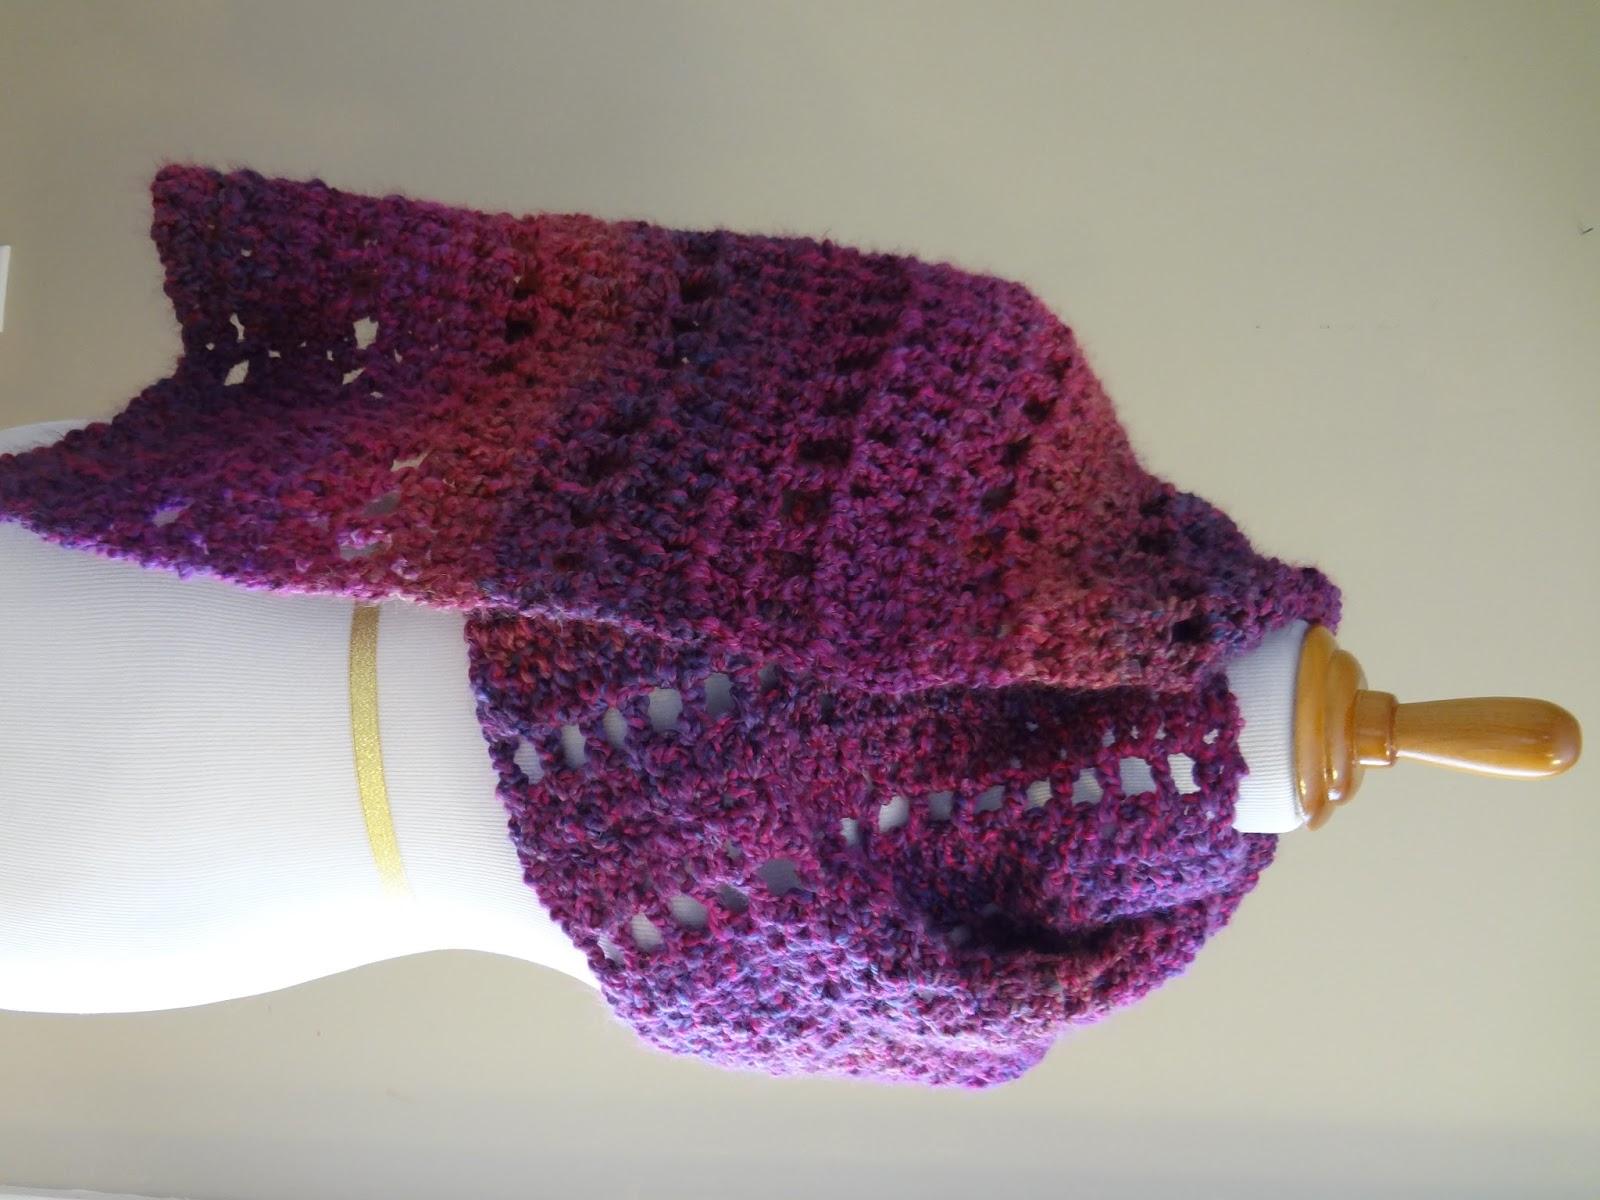 Free Crochet Pattern Shawl Beginner : Fiber Flux: Free Crochet Pattern...Mulberry Shawl!